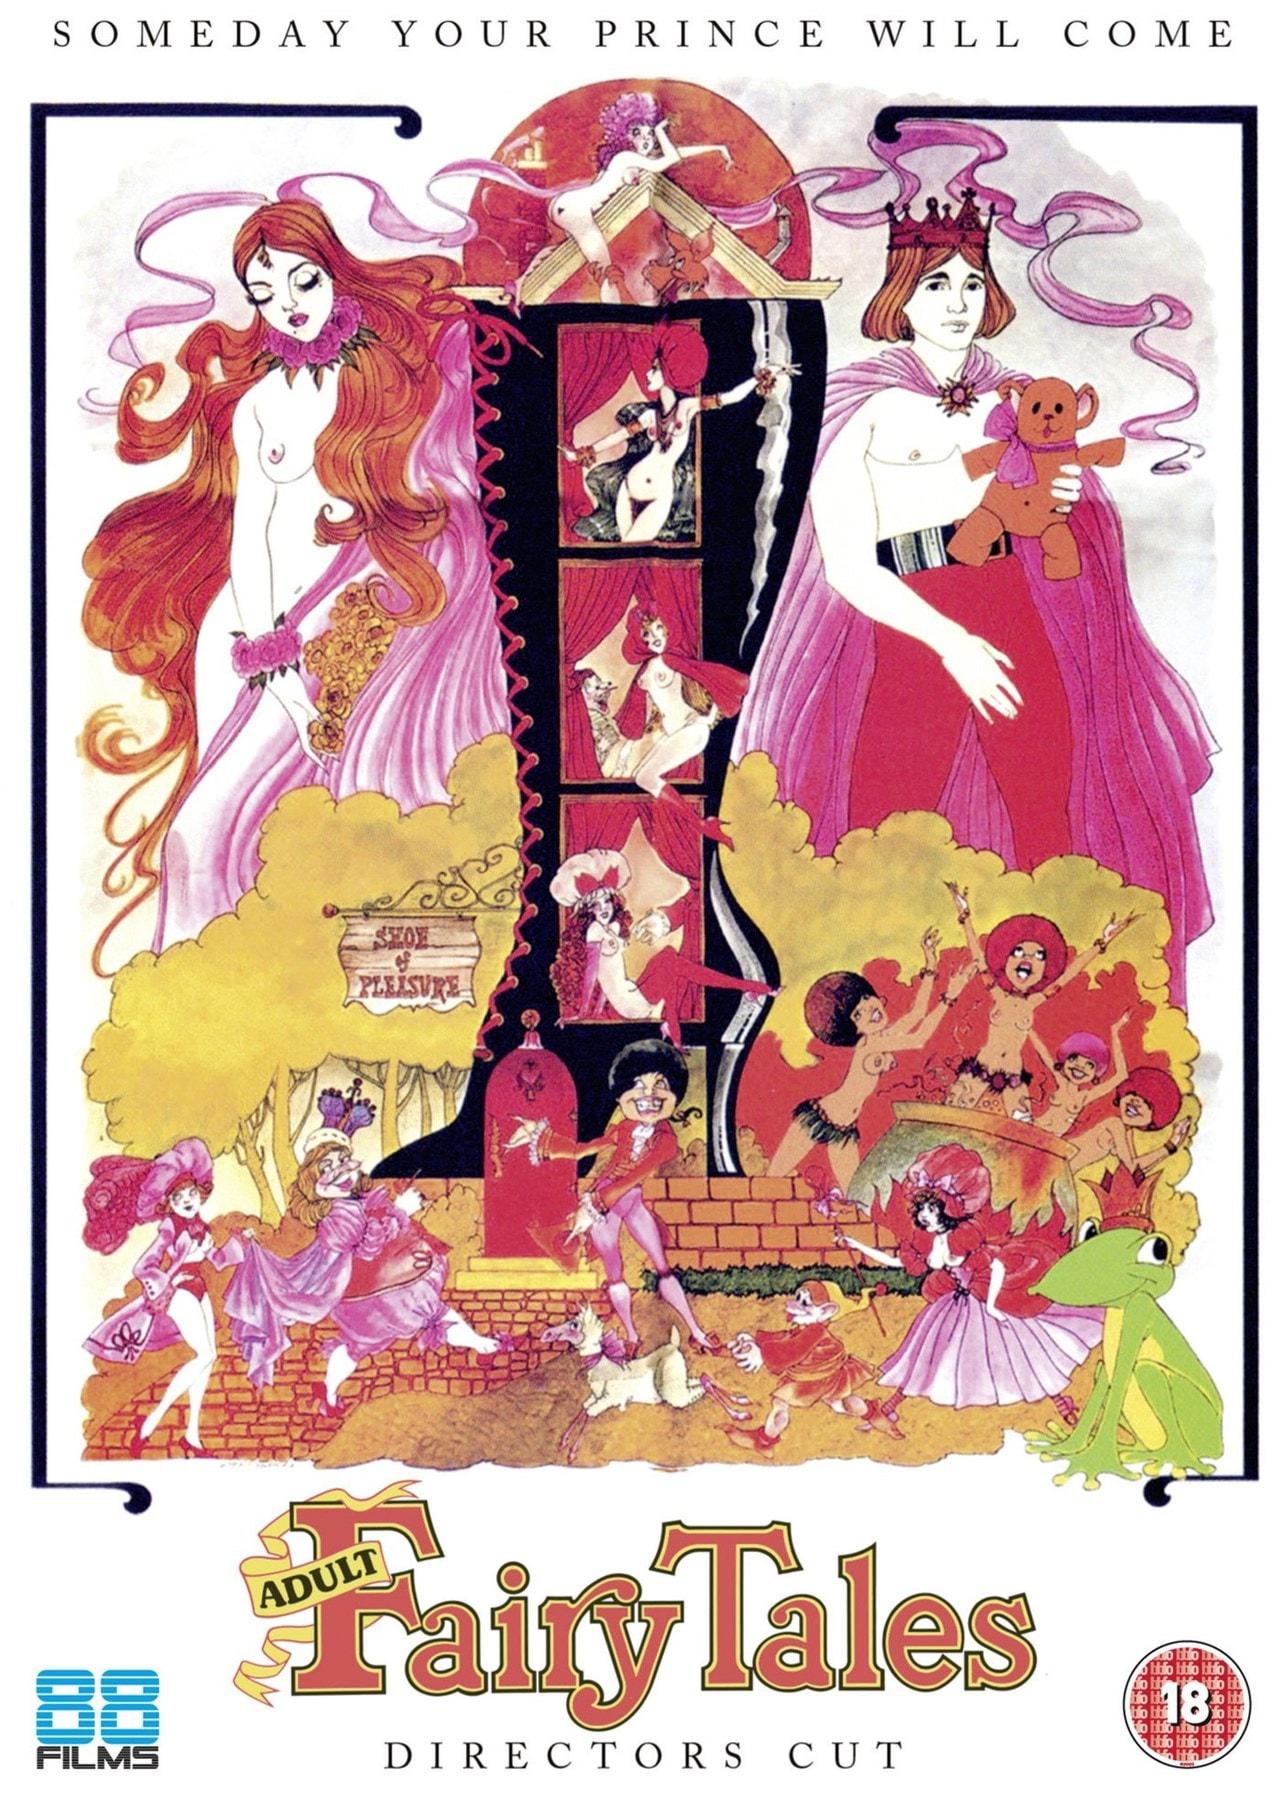 Adult Fairy Tales: Director's Cut - 2